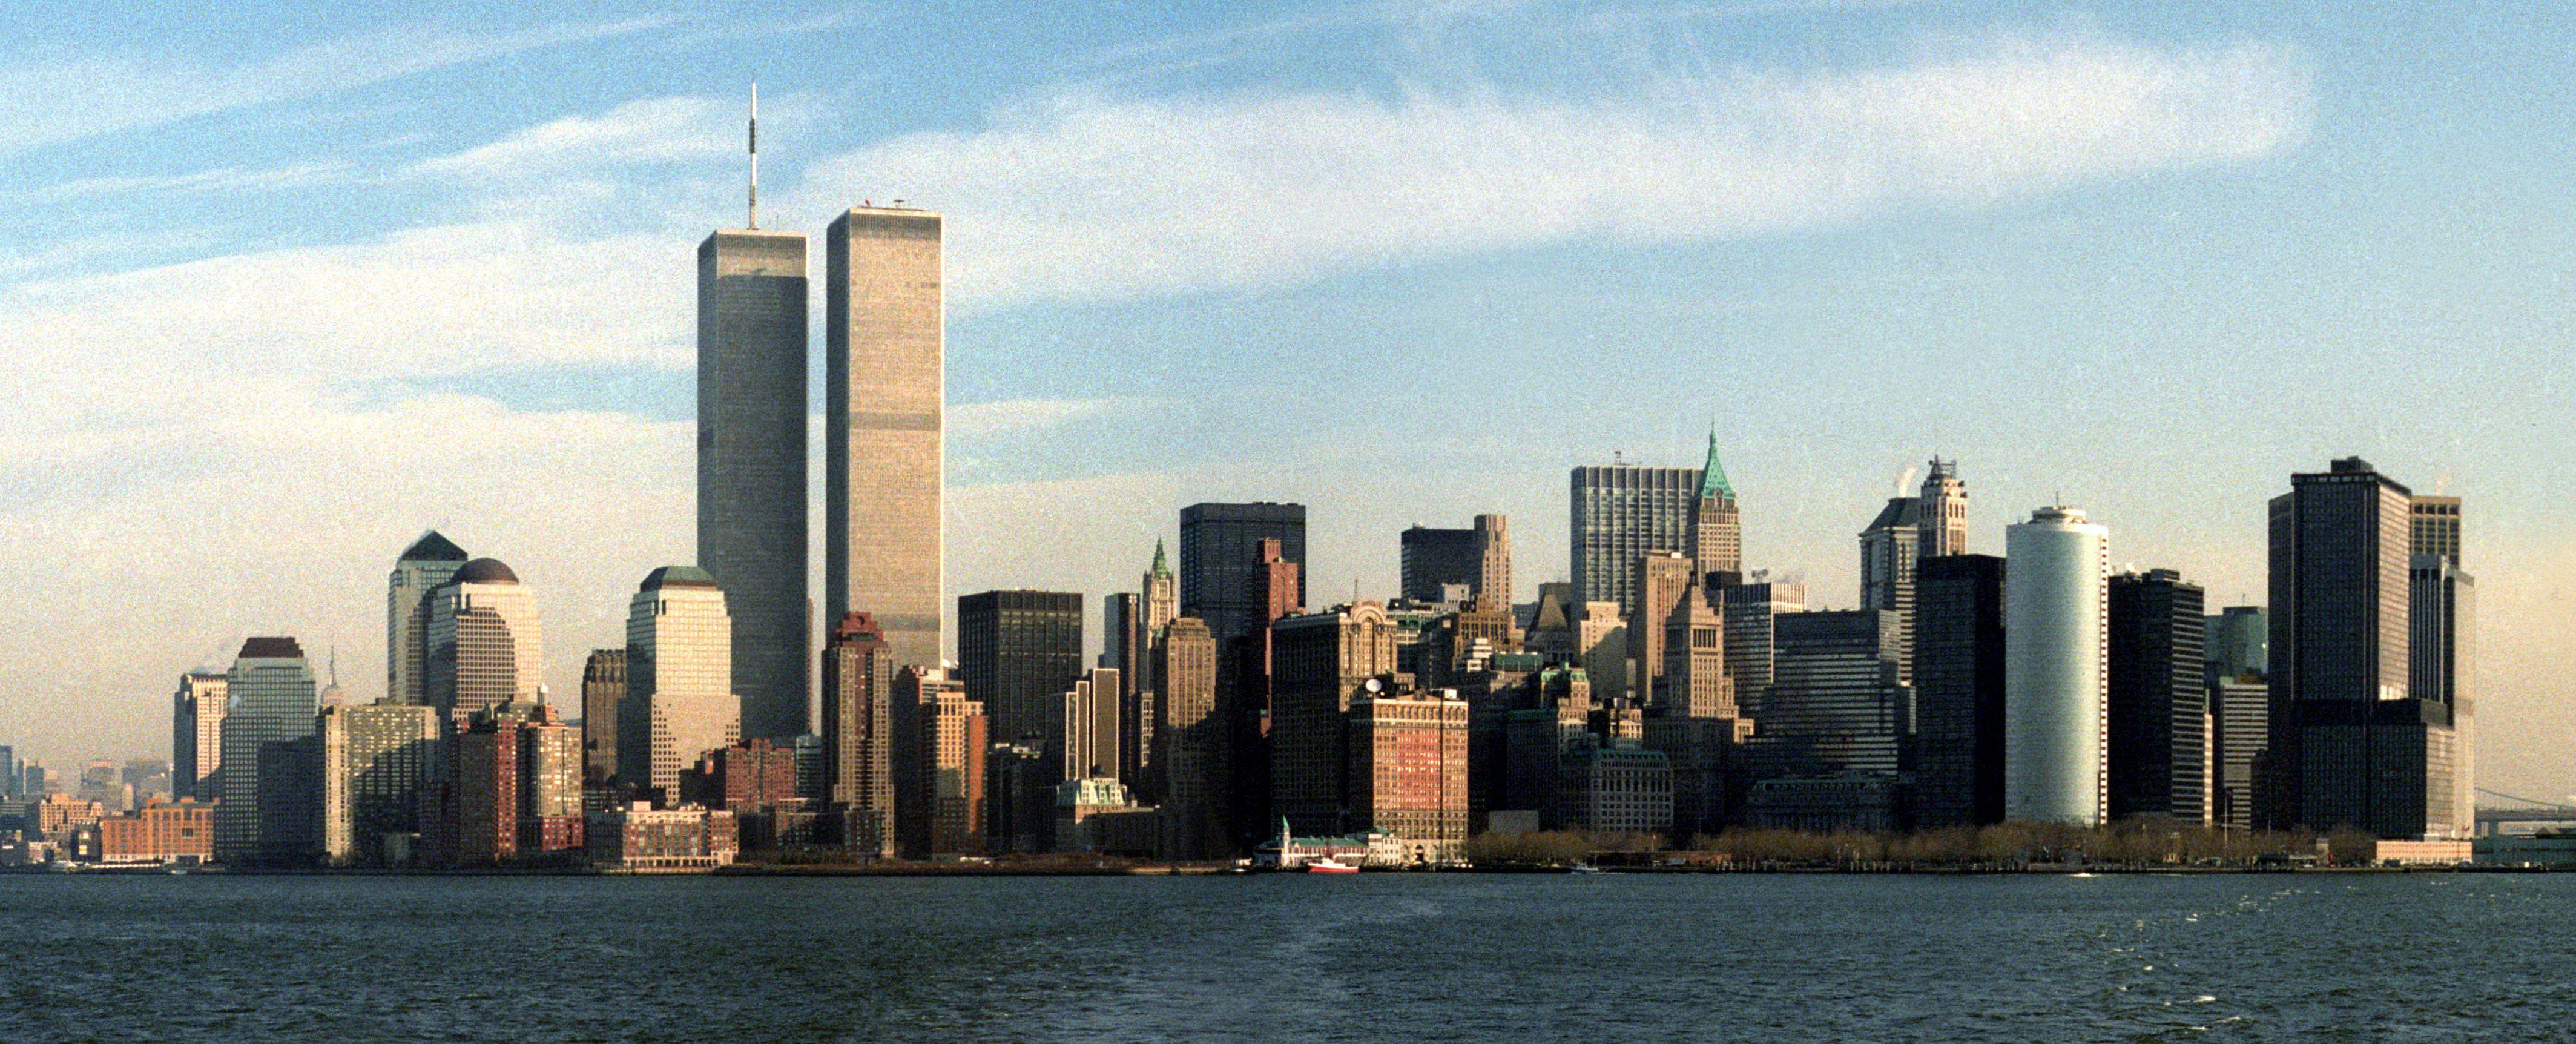 world trade center in new york before september 9 11 happened in photos quartz. Black Bedroom Furniture Sets. Home Design Ideas